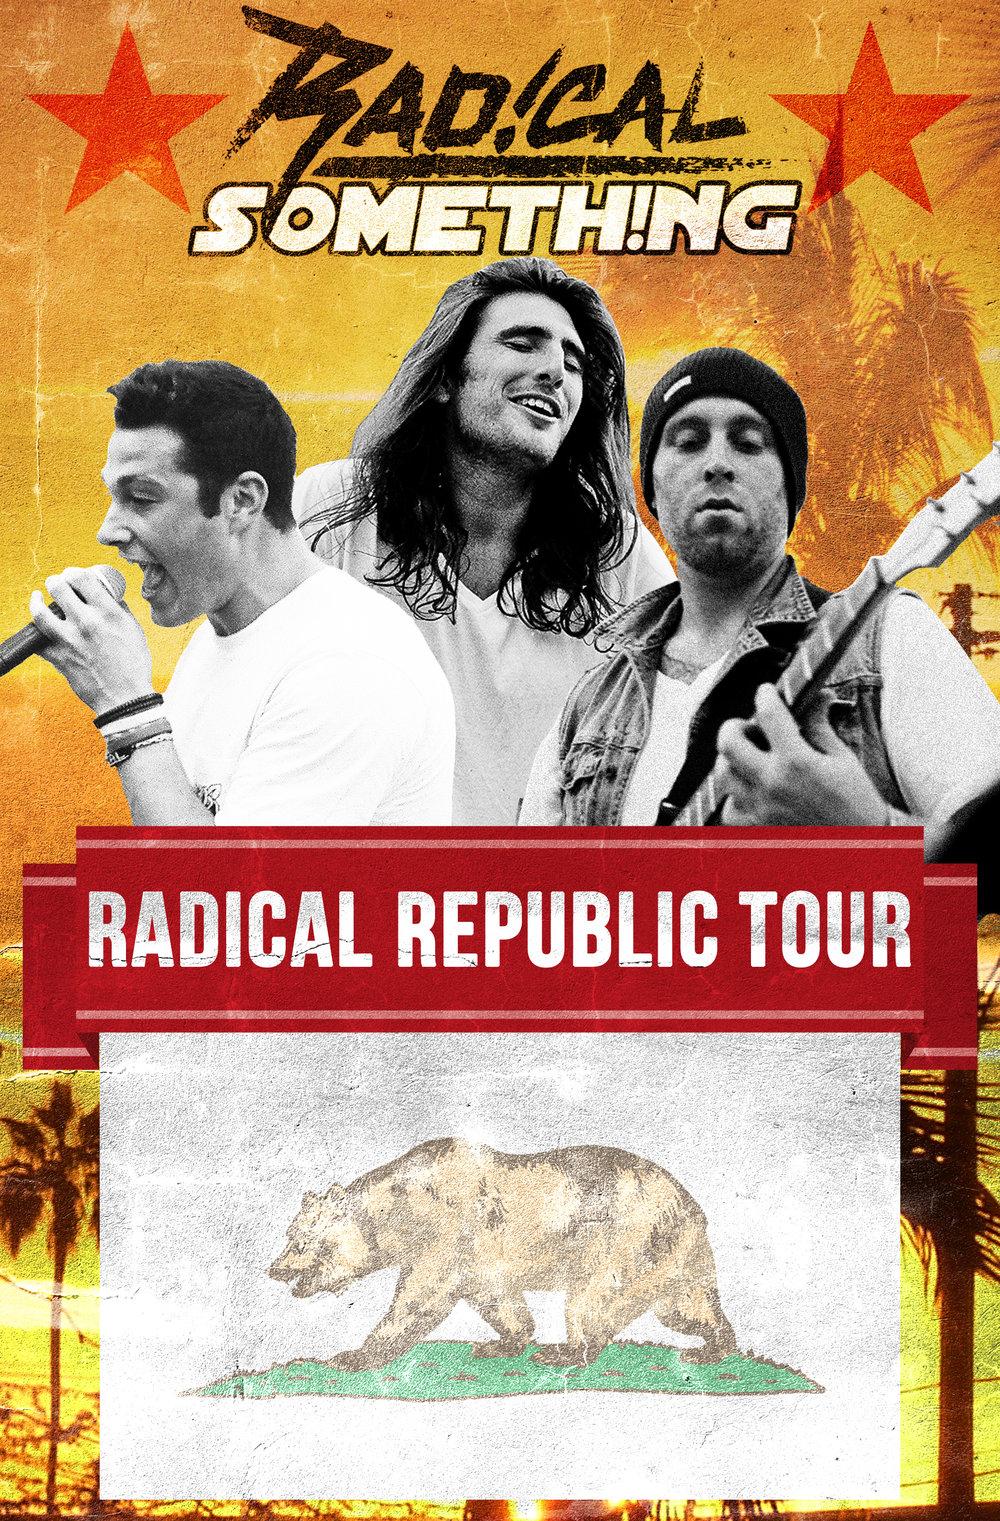 RadicalRepublicTour.jpg